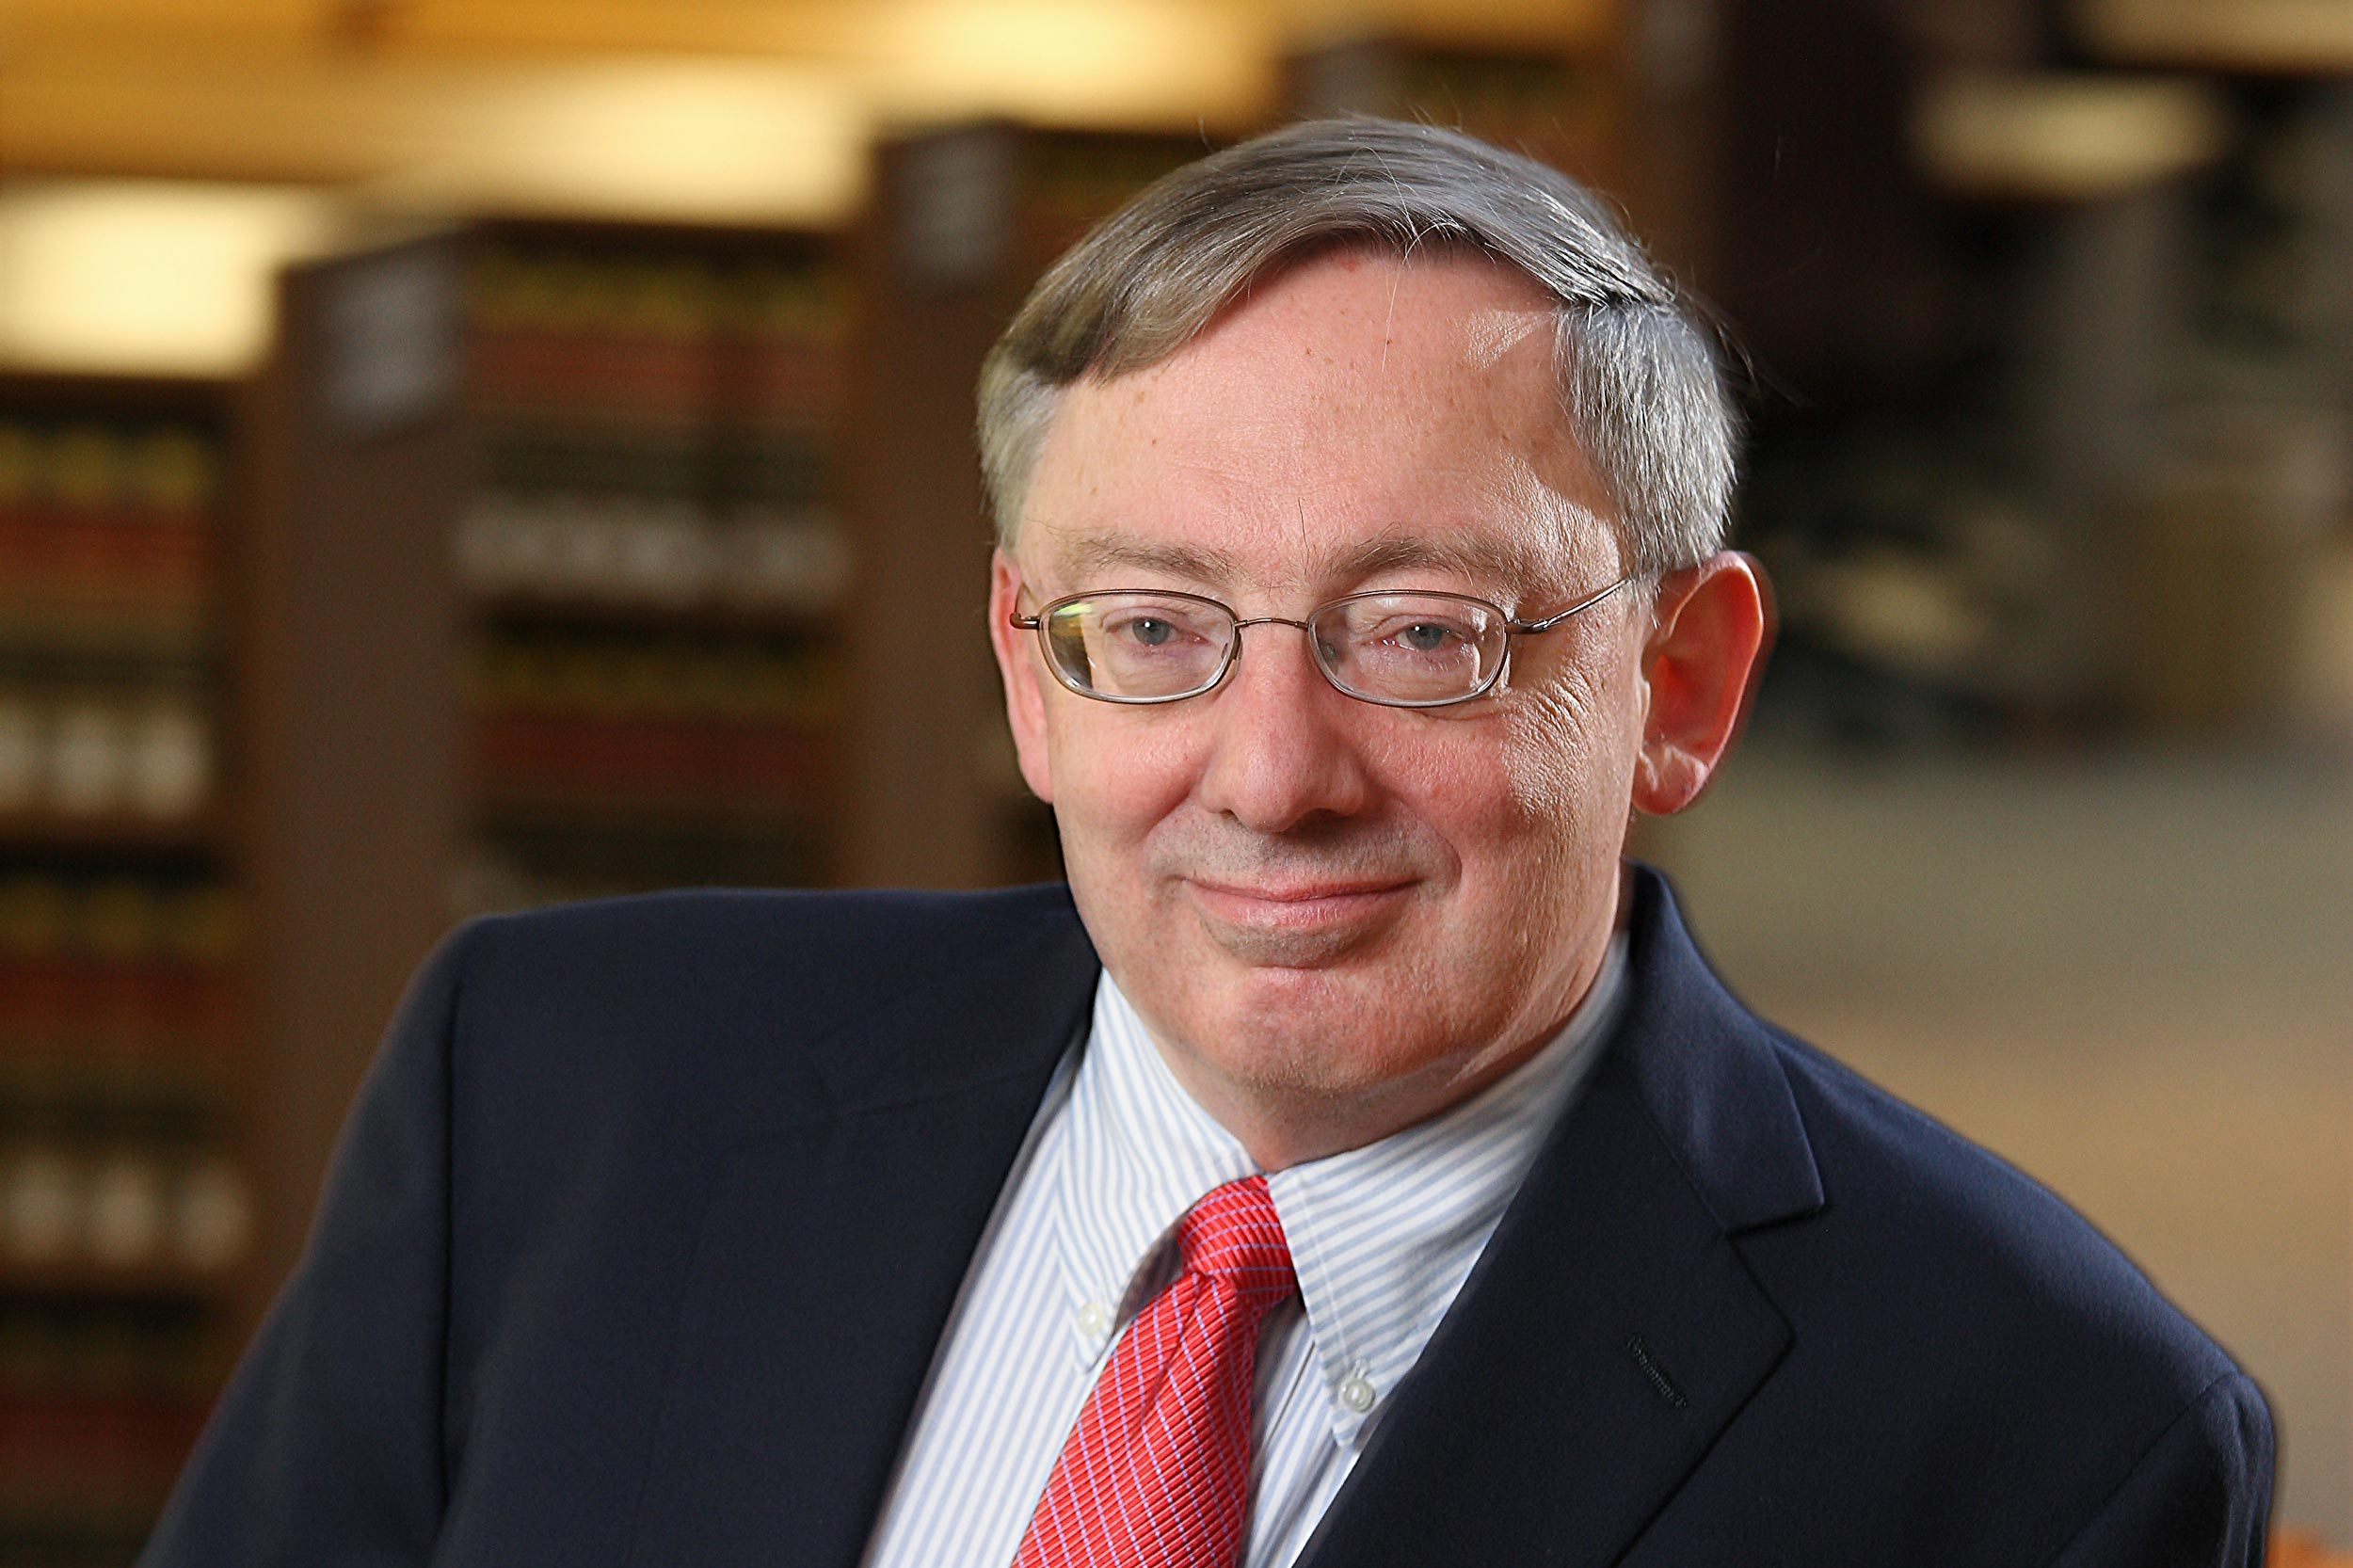 Robert E. Scott Distinguished Professor of Law, Professor of Religious Studies